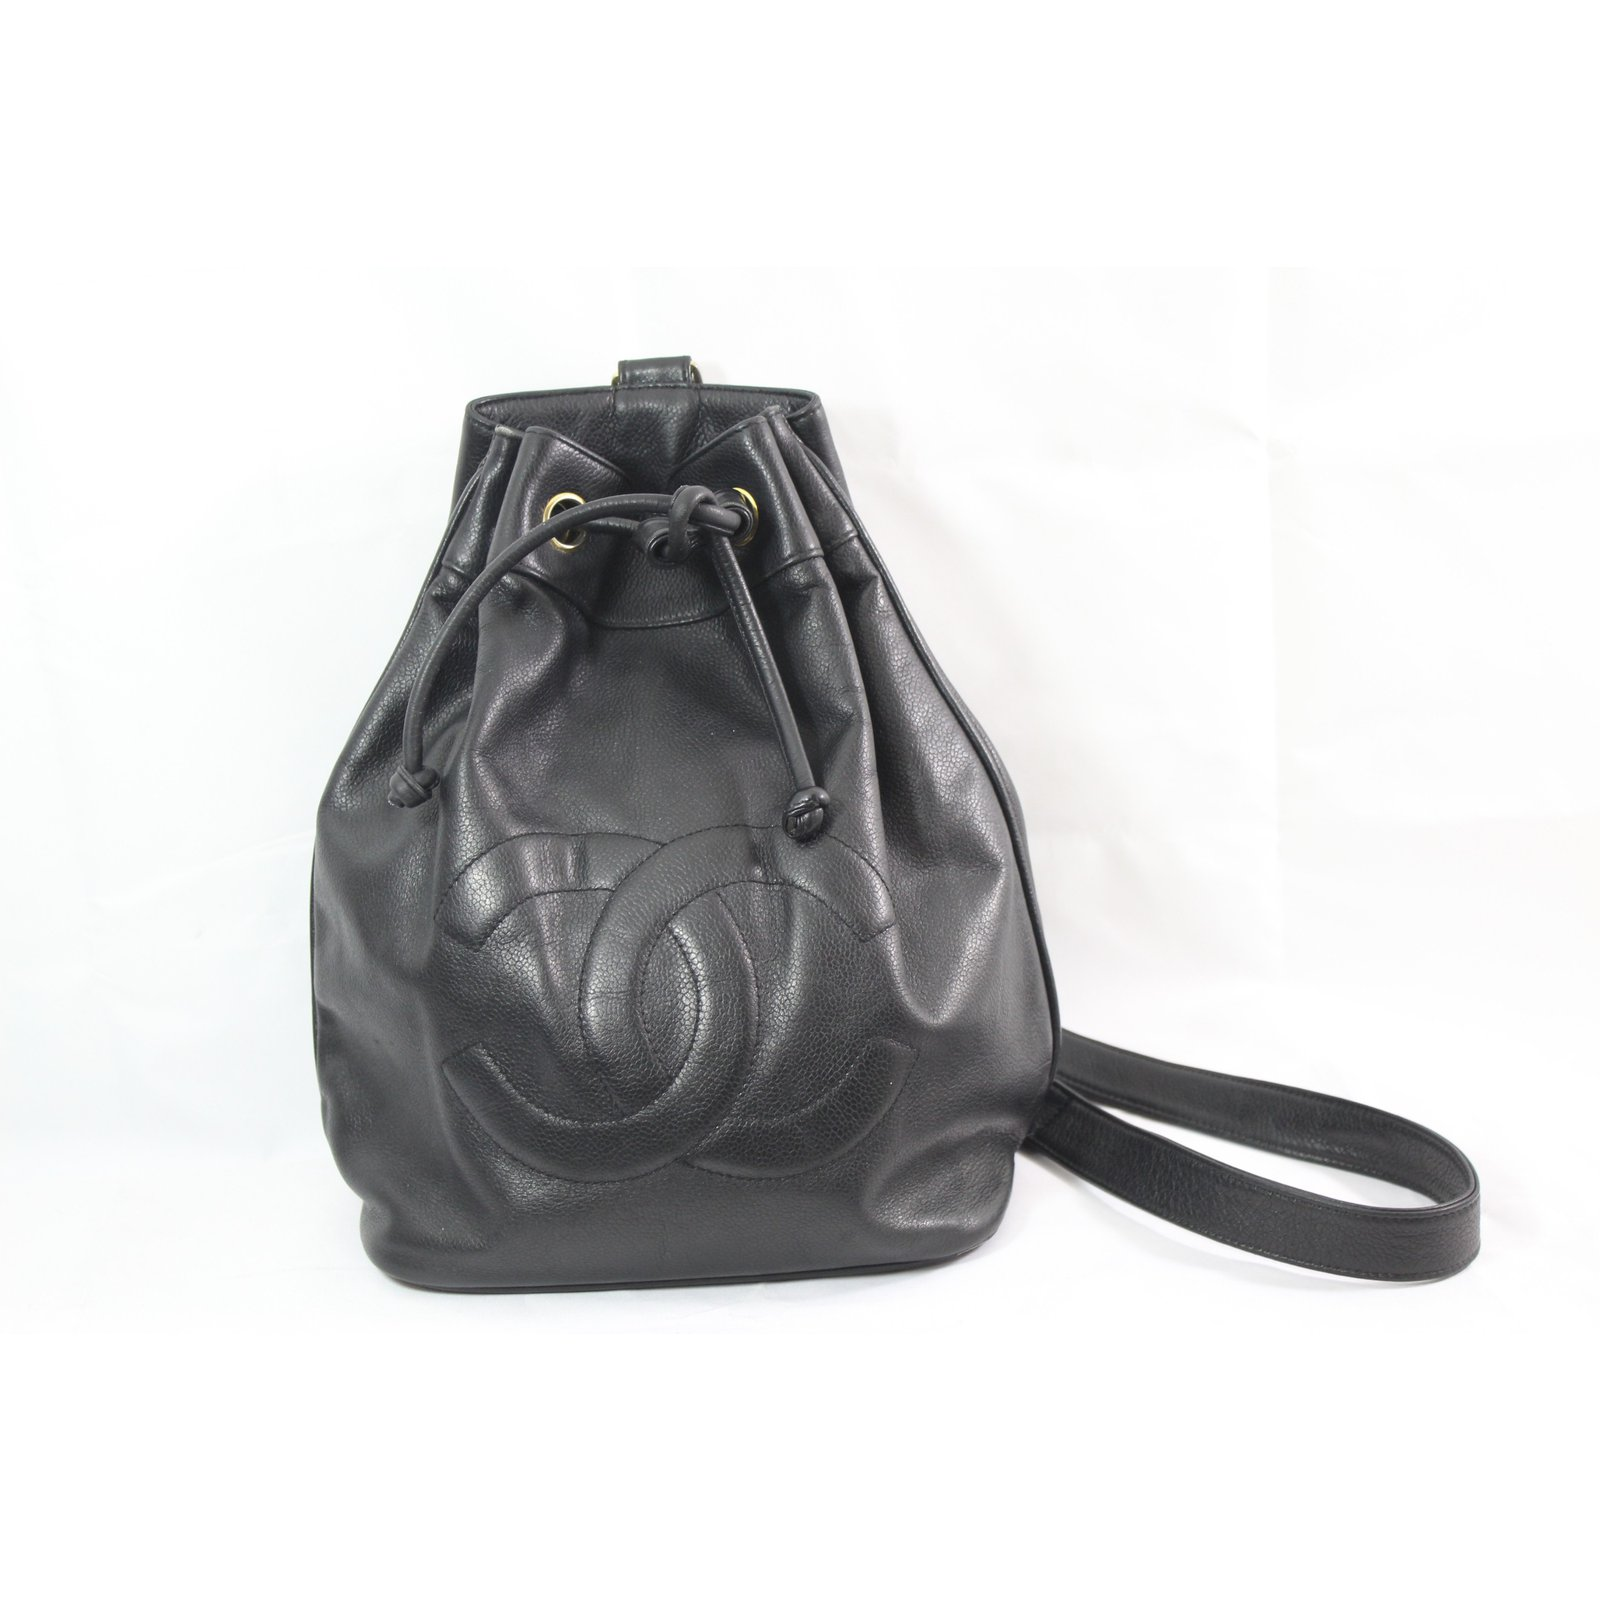 dc5590205f4c Chanel backpack backpacks leather black ref joli closet jpg 1600x1600 Black  chanel backpack